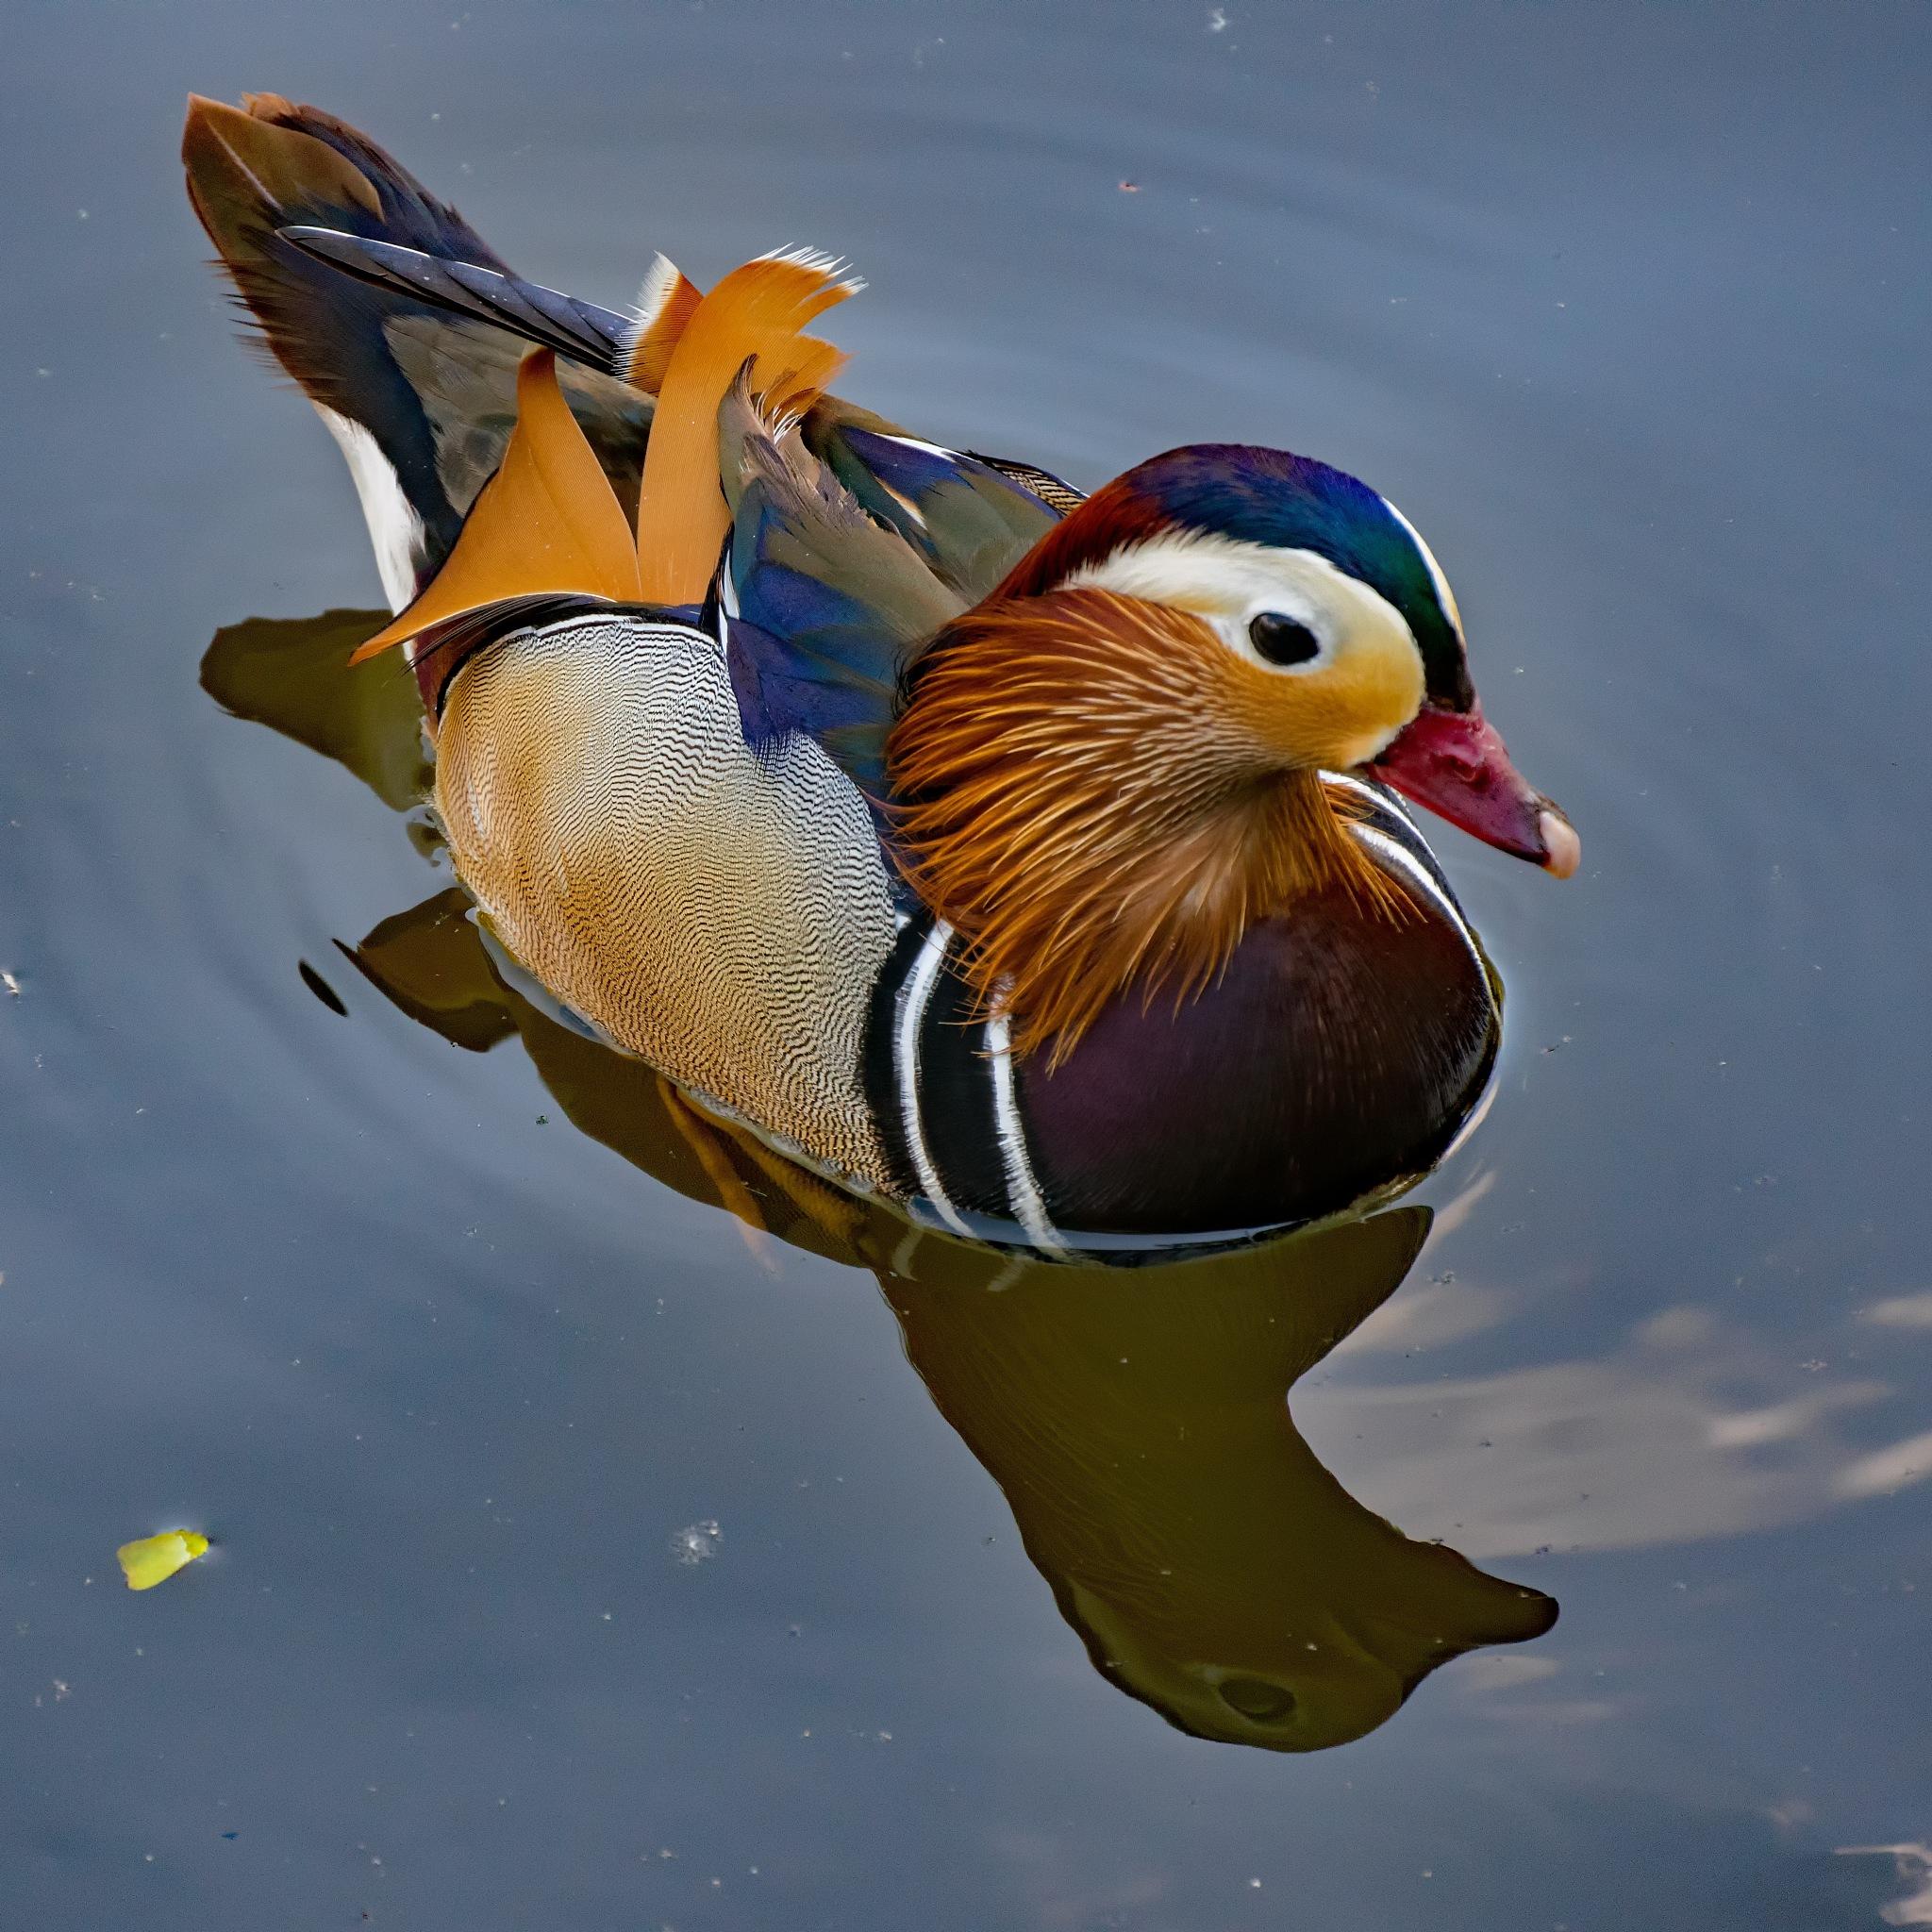 Mandarin duck (male) by HaWaFoTo